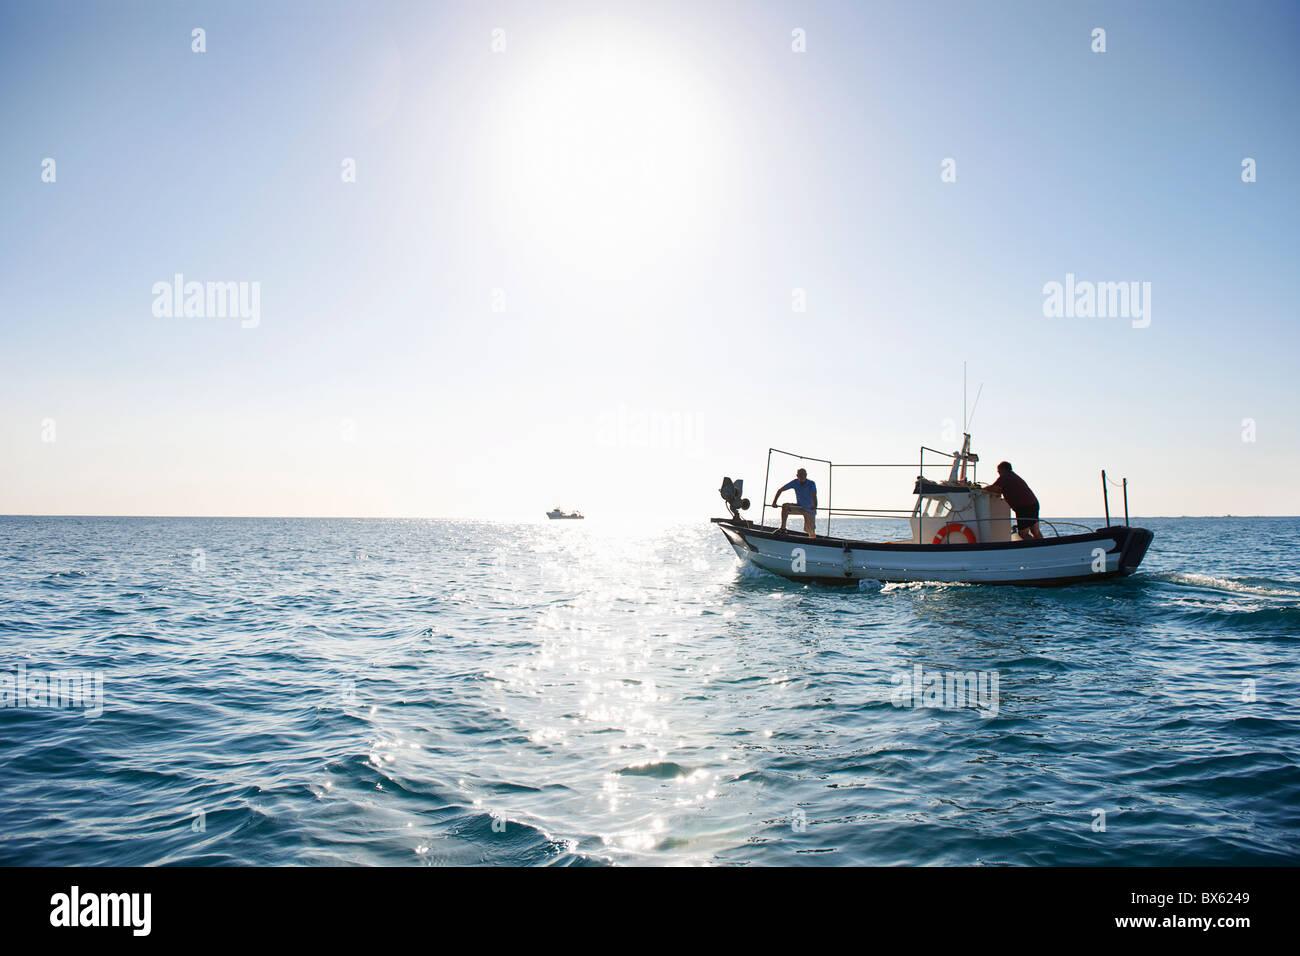 Fishermen on fishing boat at sea - Stock Image